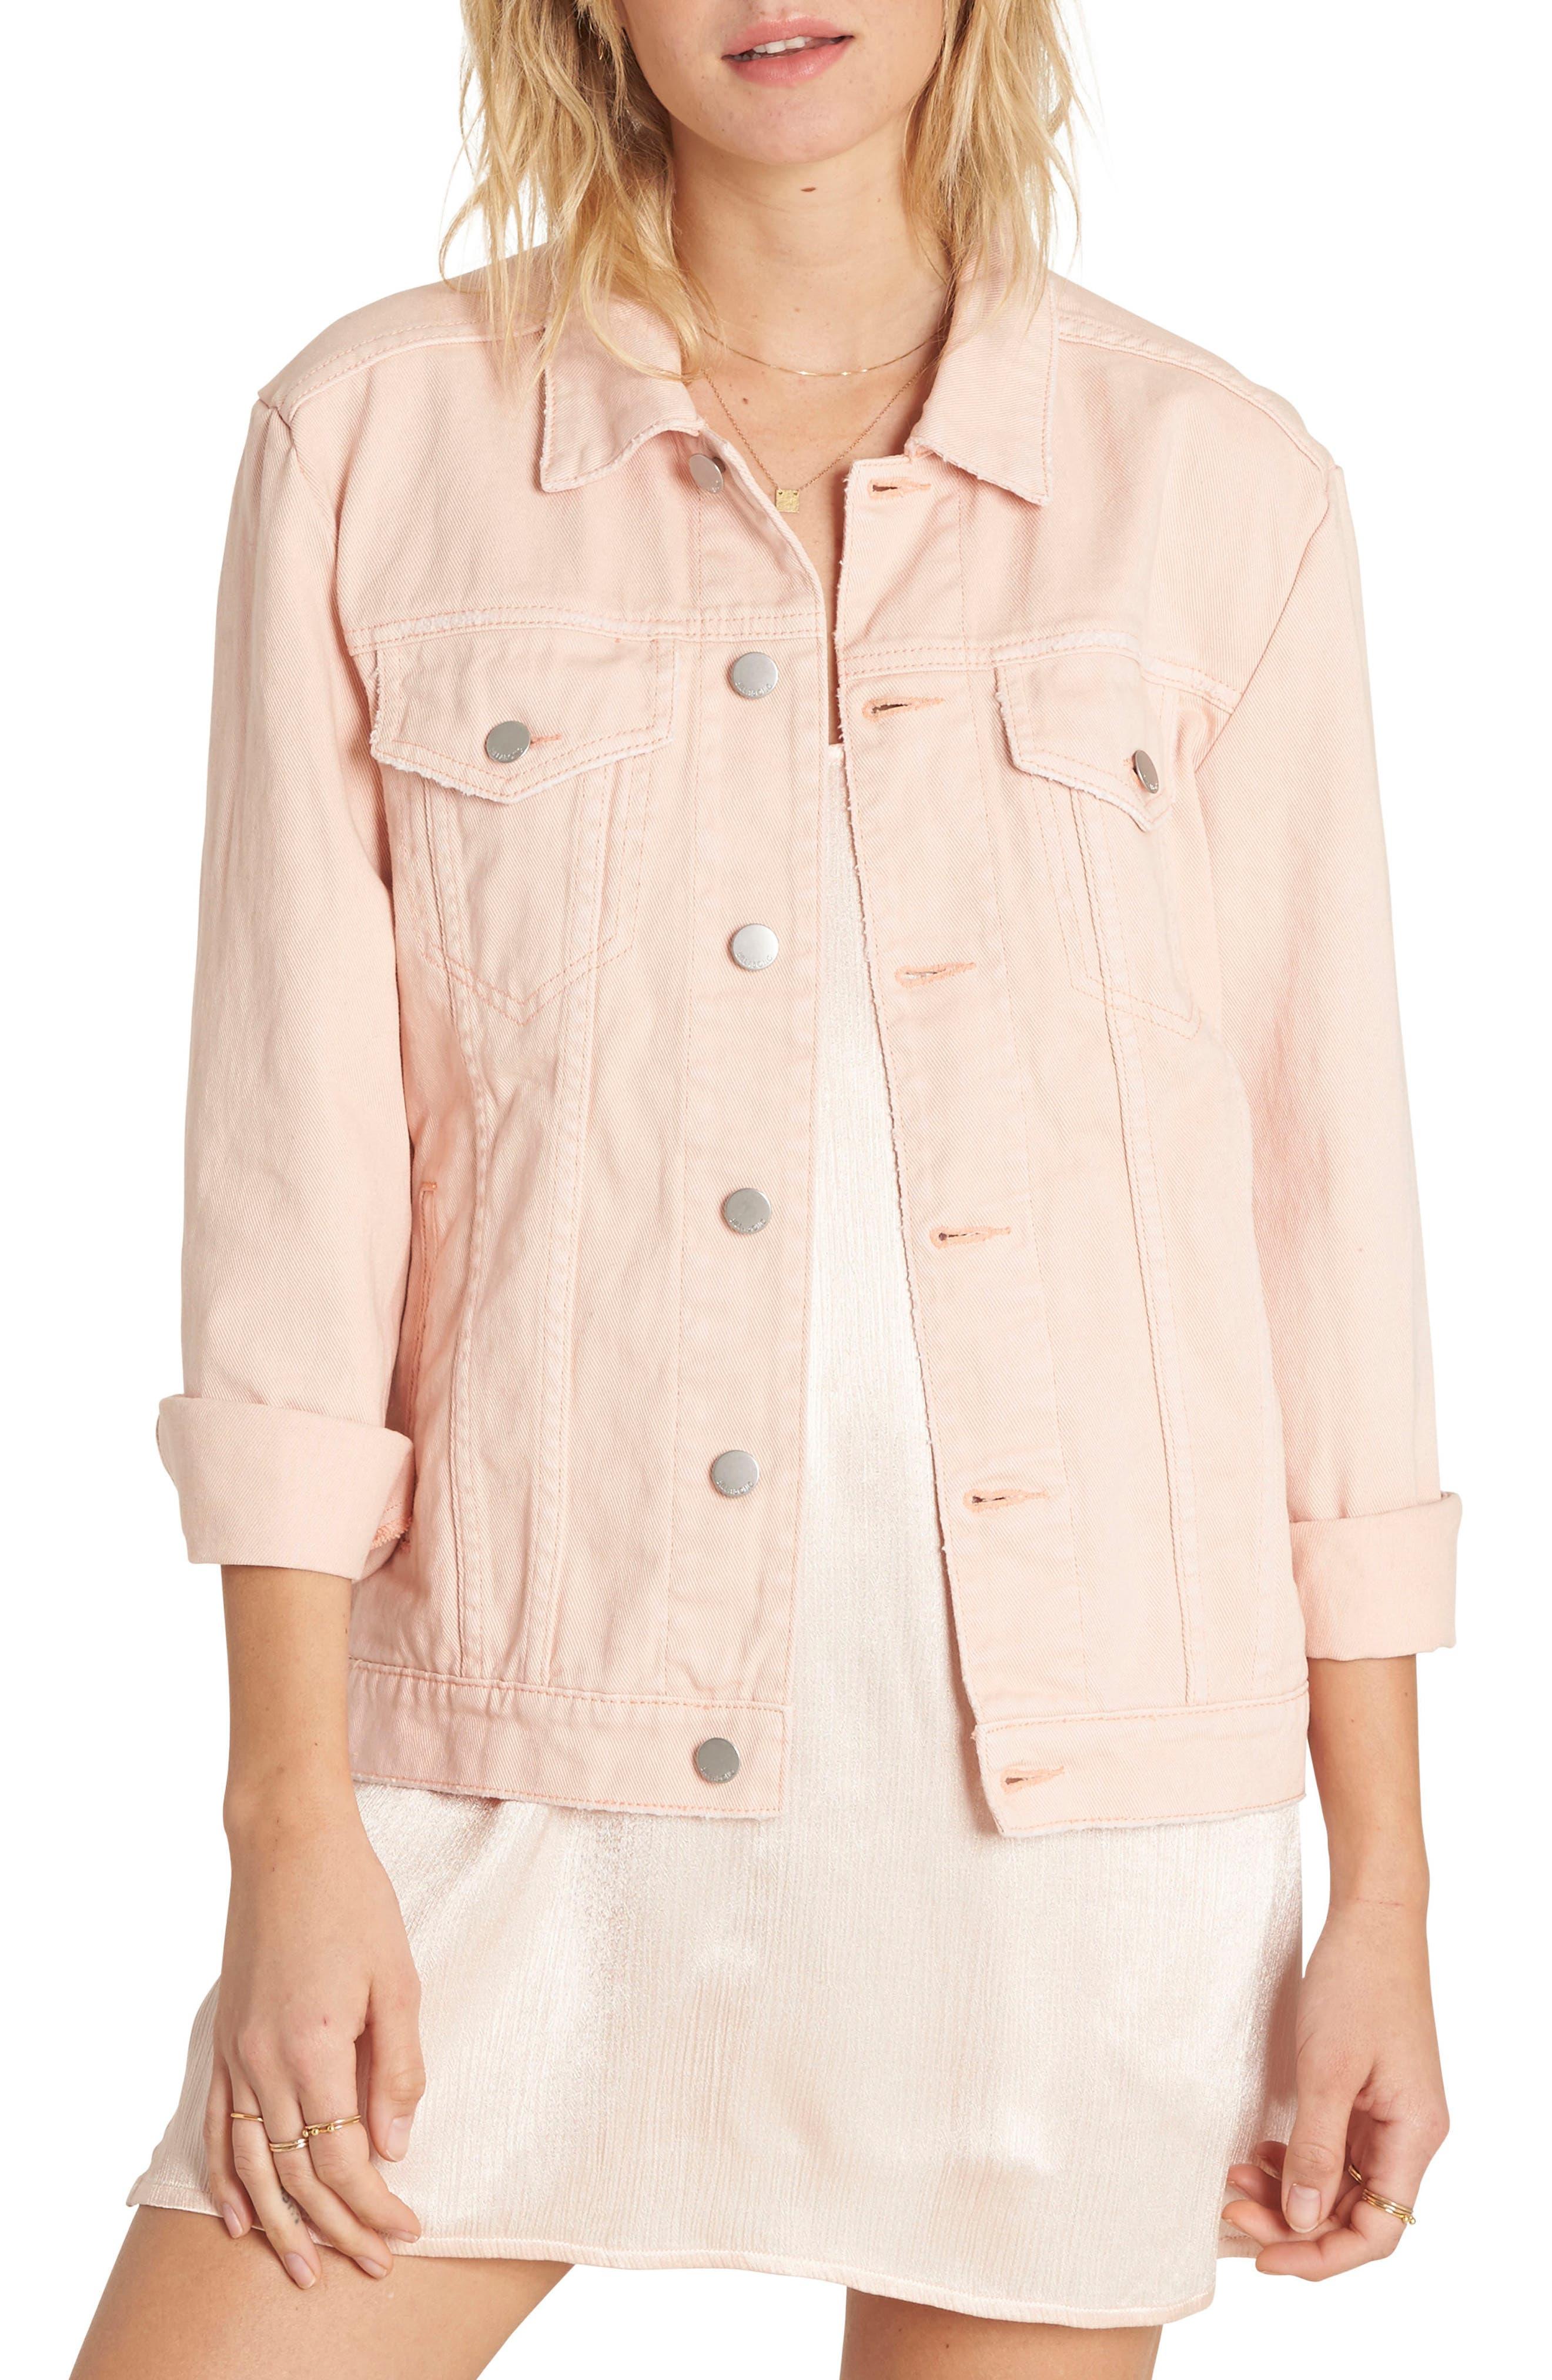 Always Truckin' Denim Jacket,                         Main,                         color, Pearl Pink